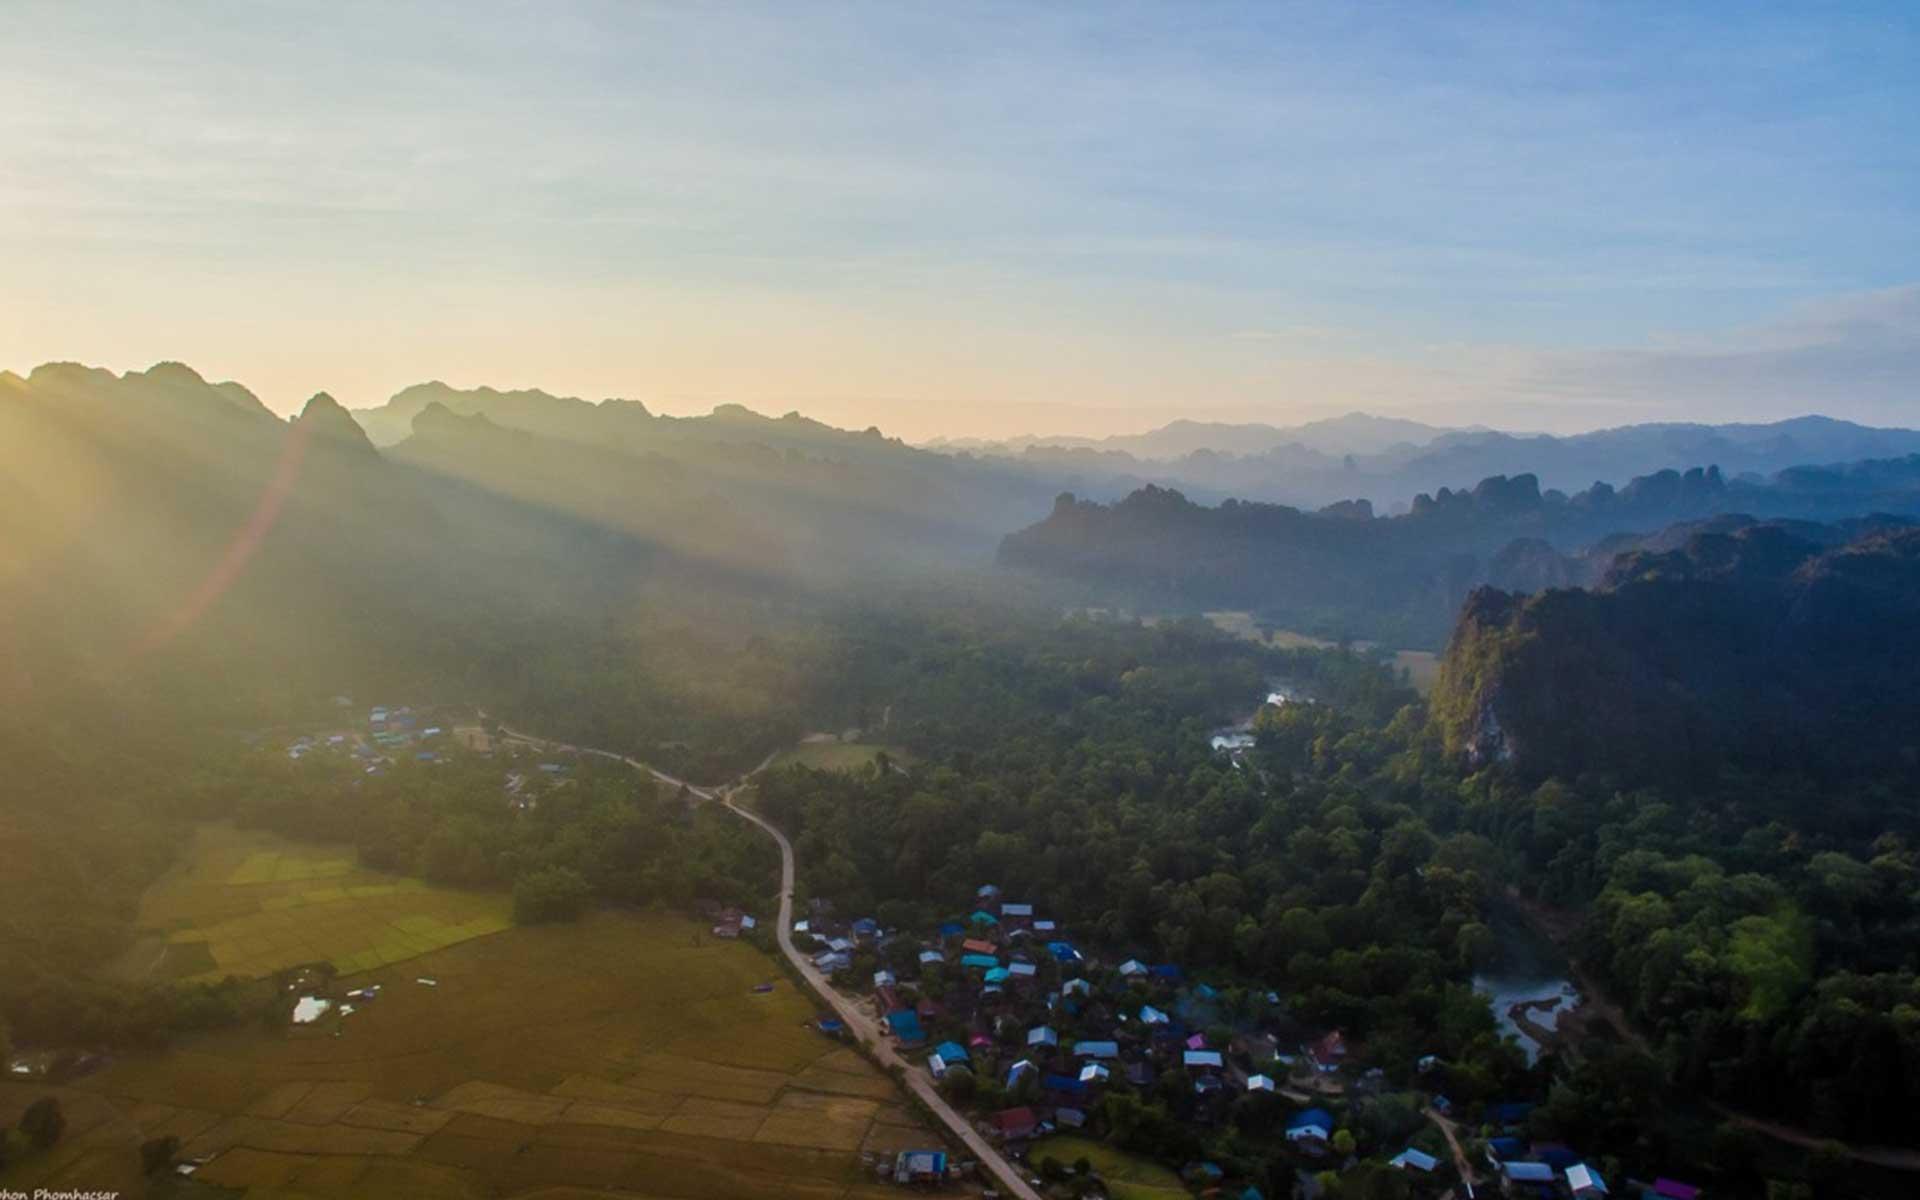 LAOS Laotravel 3 Laos Travel